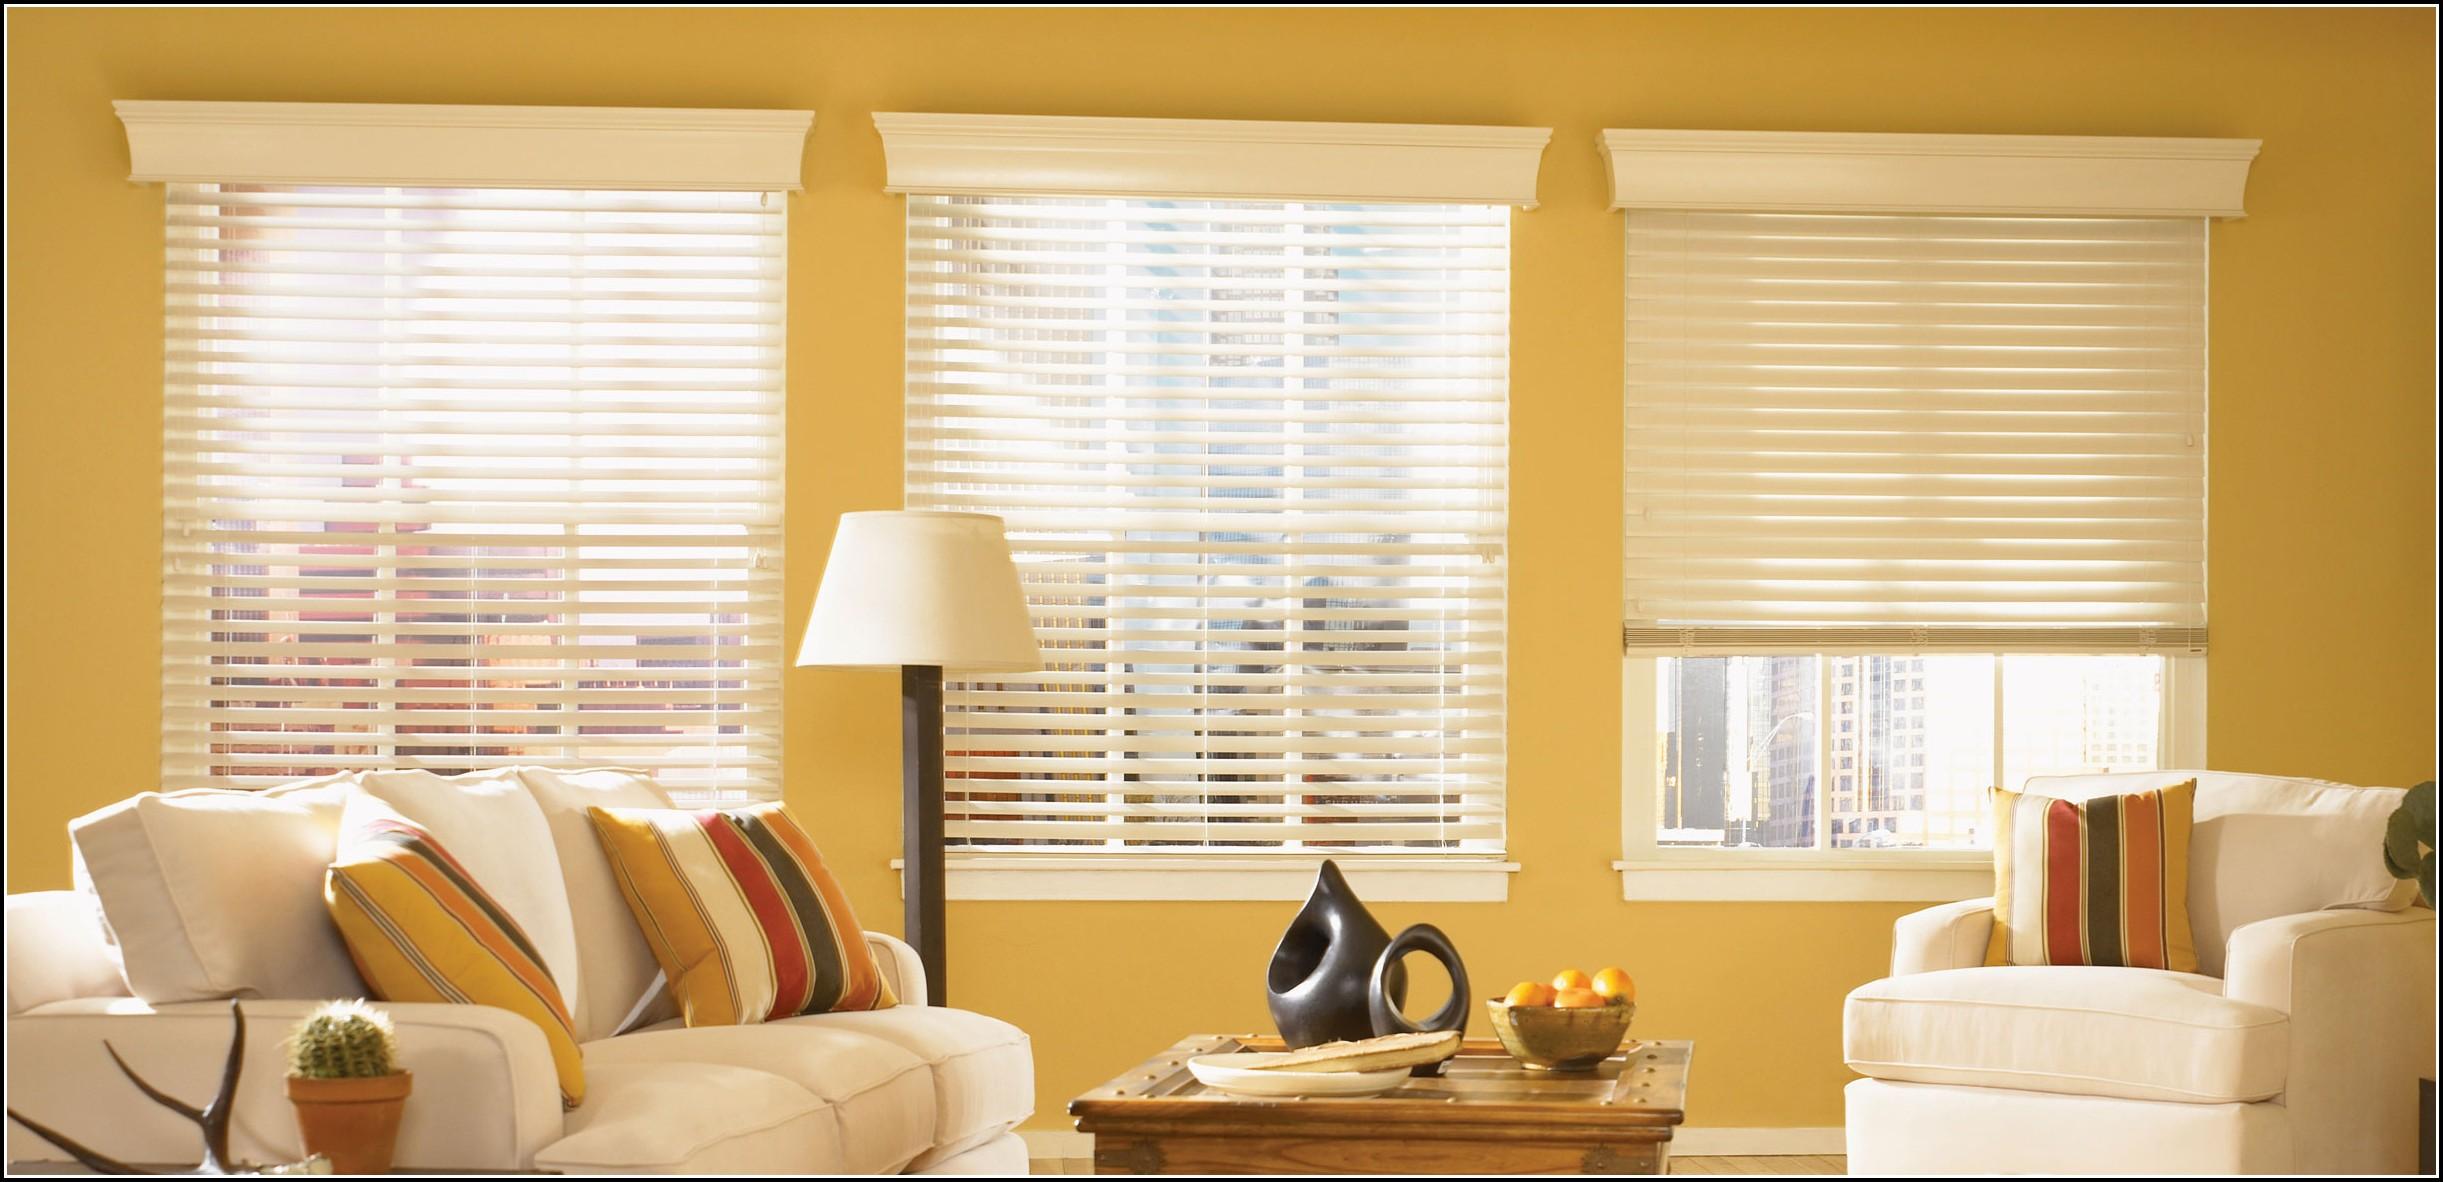 Wood Blinds Vs Curtains Curtains Home Design Ideas